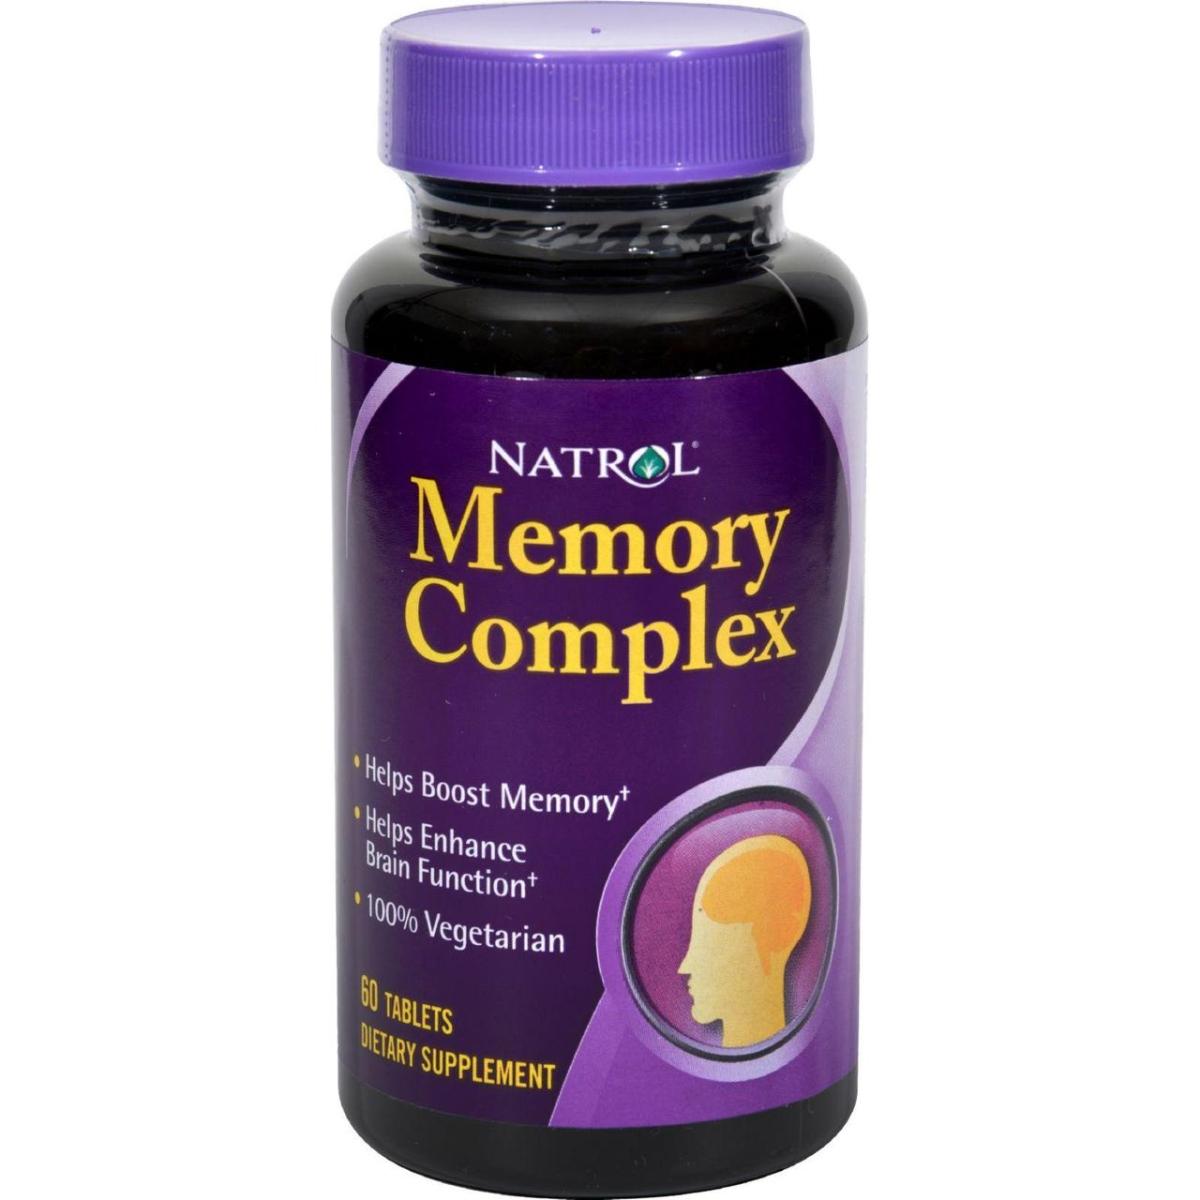 Natrol HG0129114 Memory Complex 60 Tablets